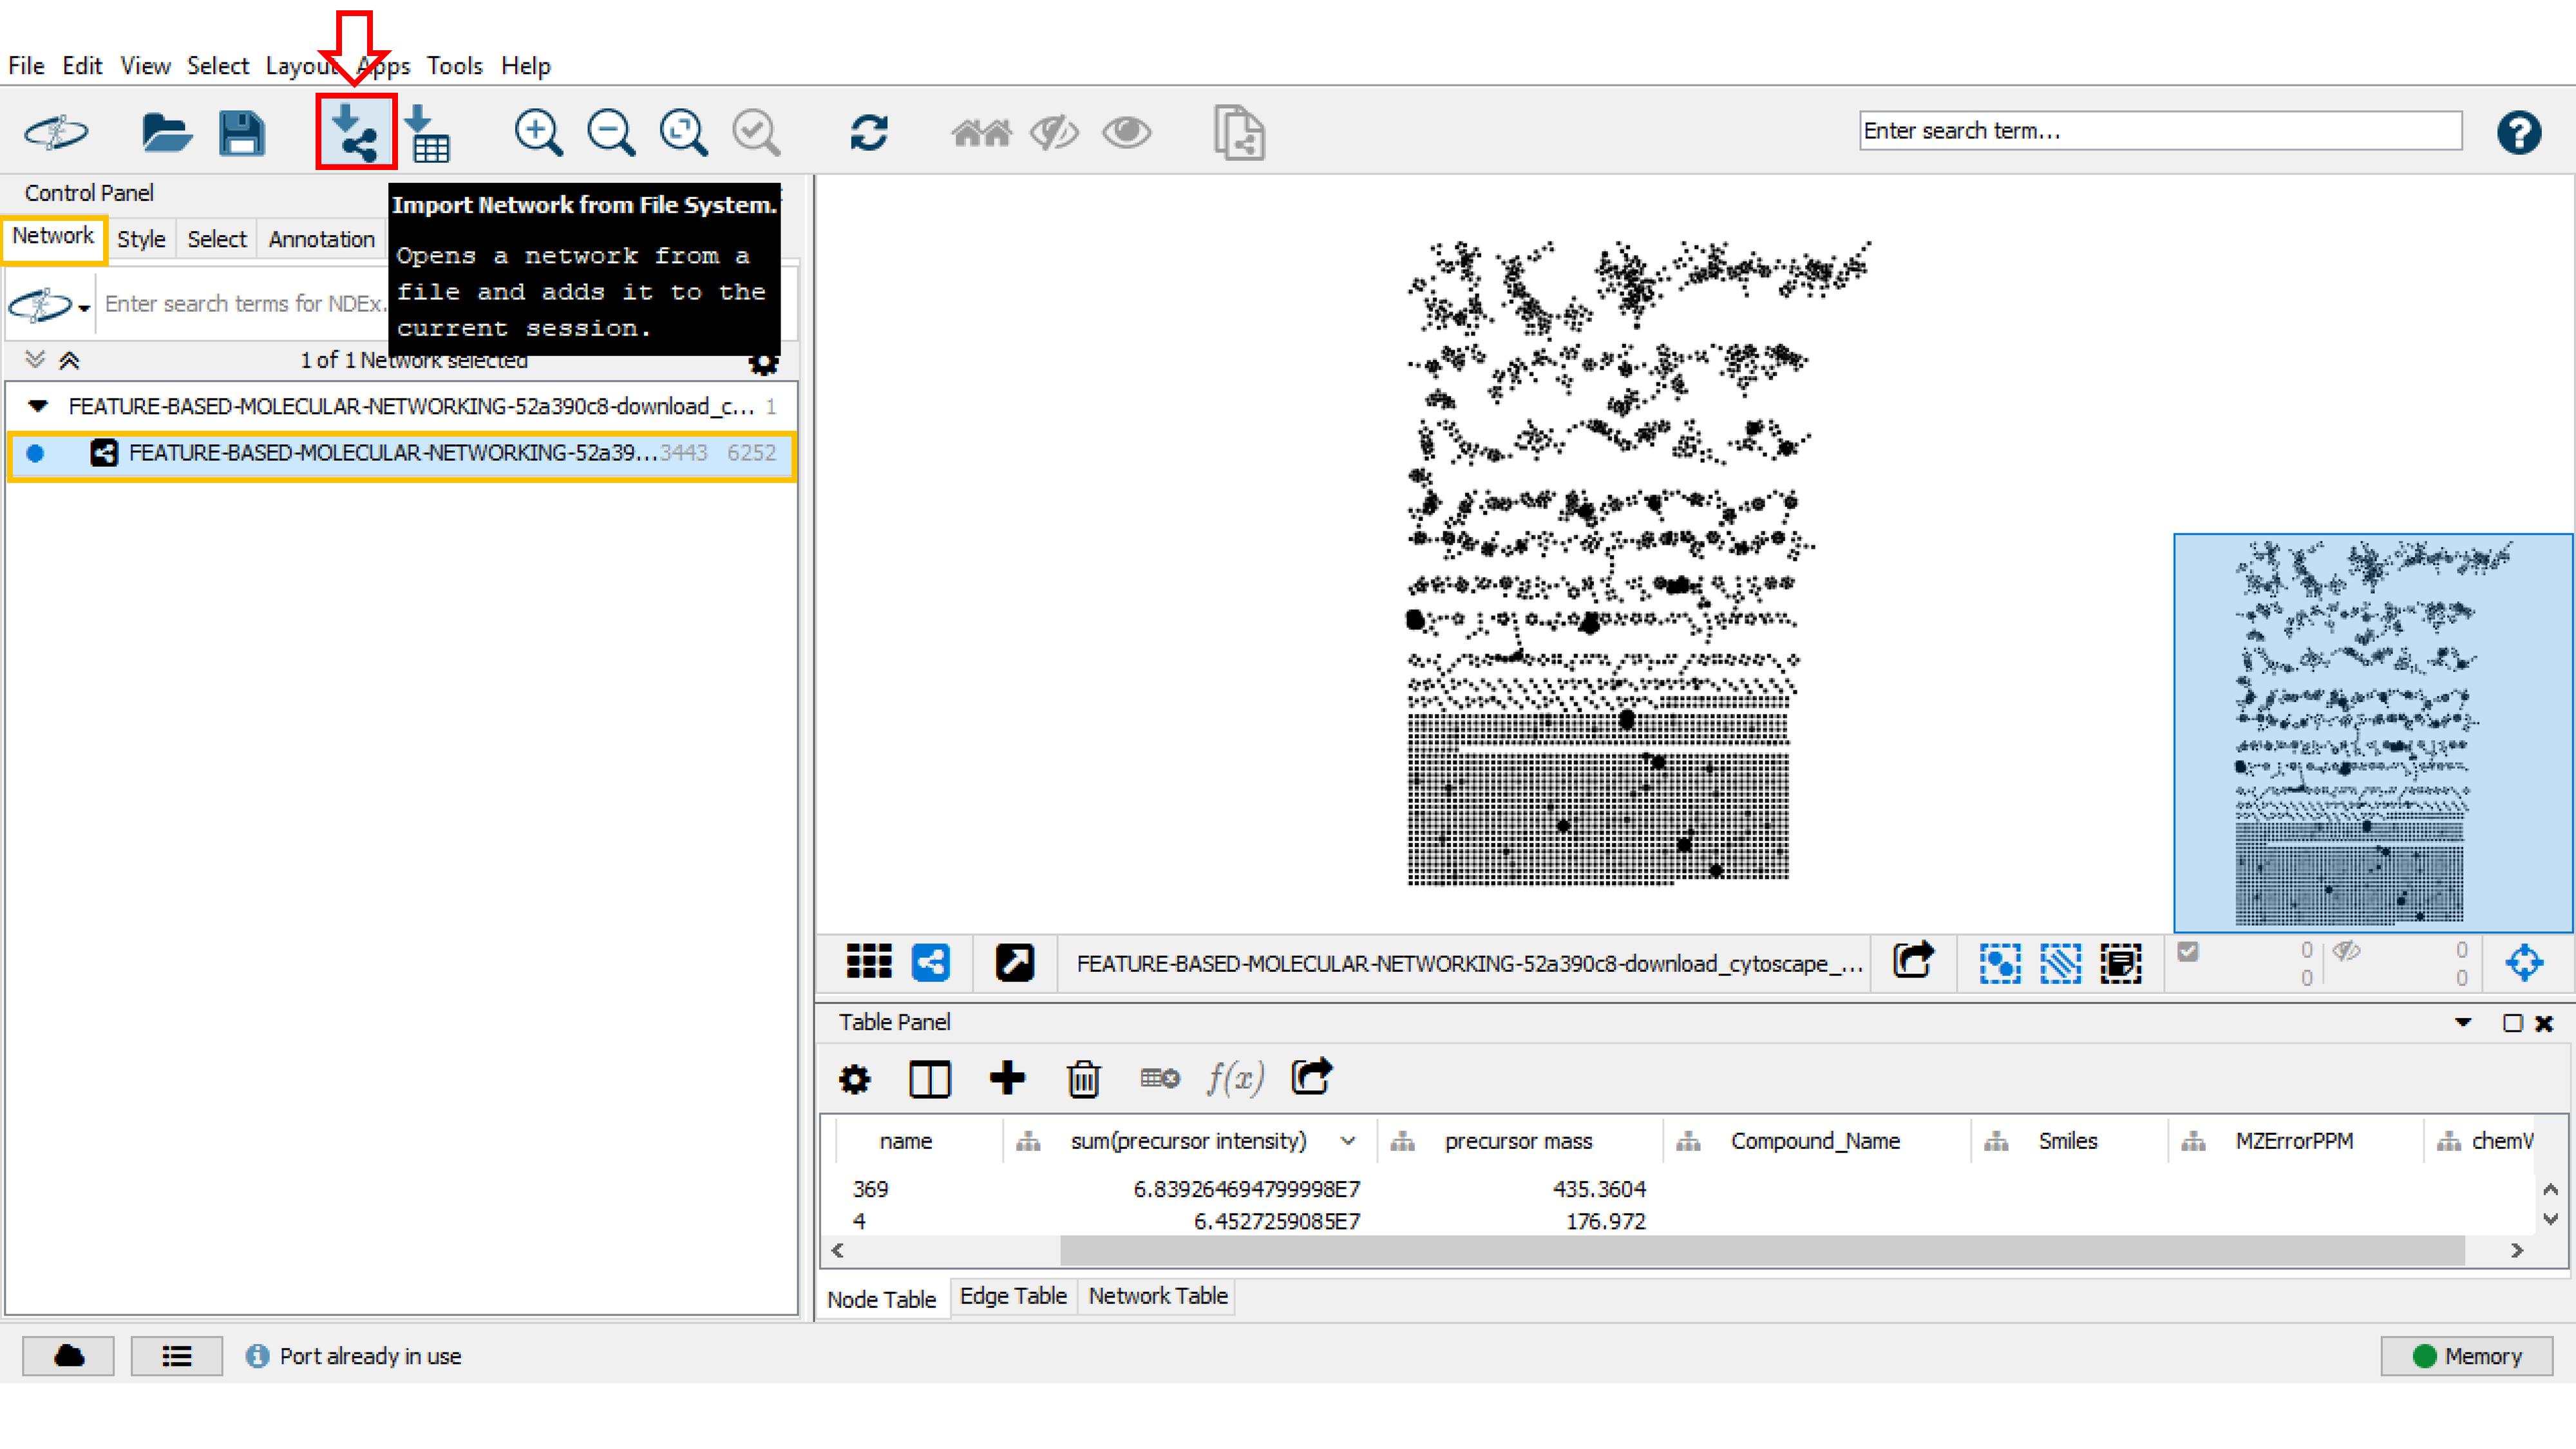 FBMW with Cytoscape - GNPS Documentation